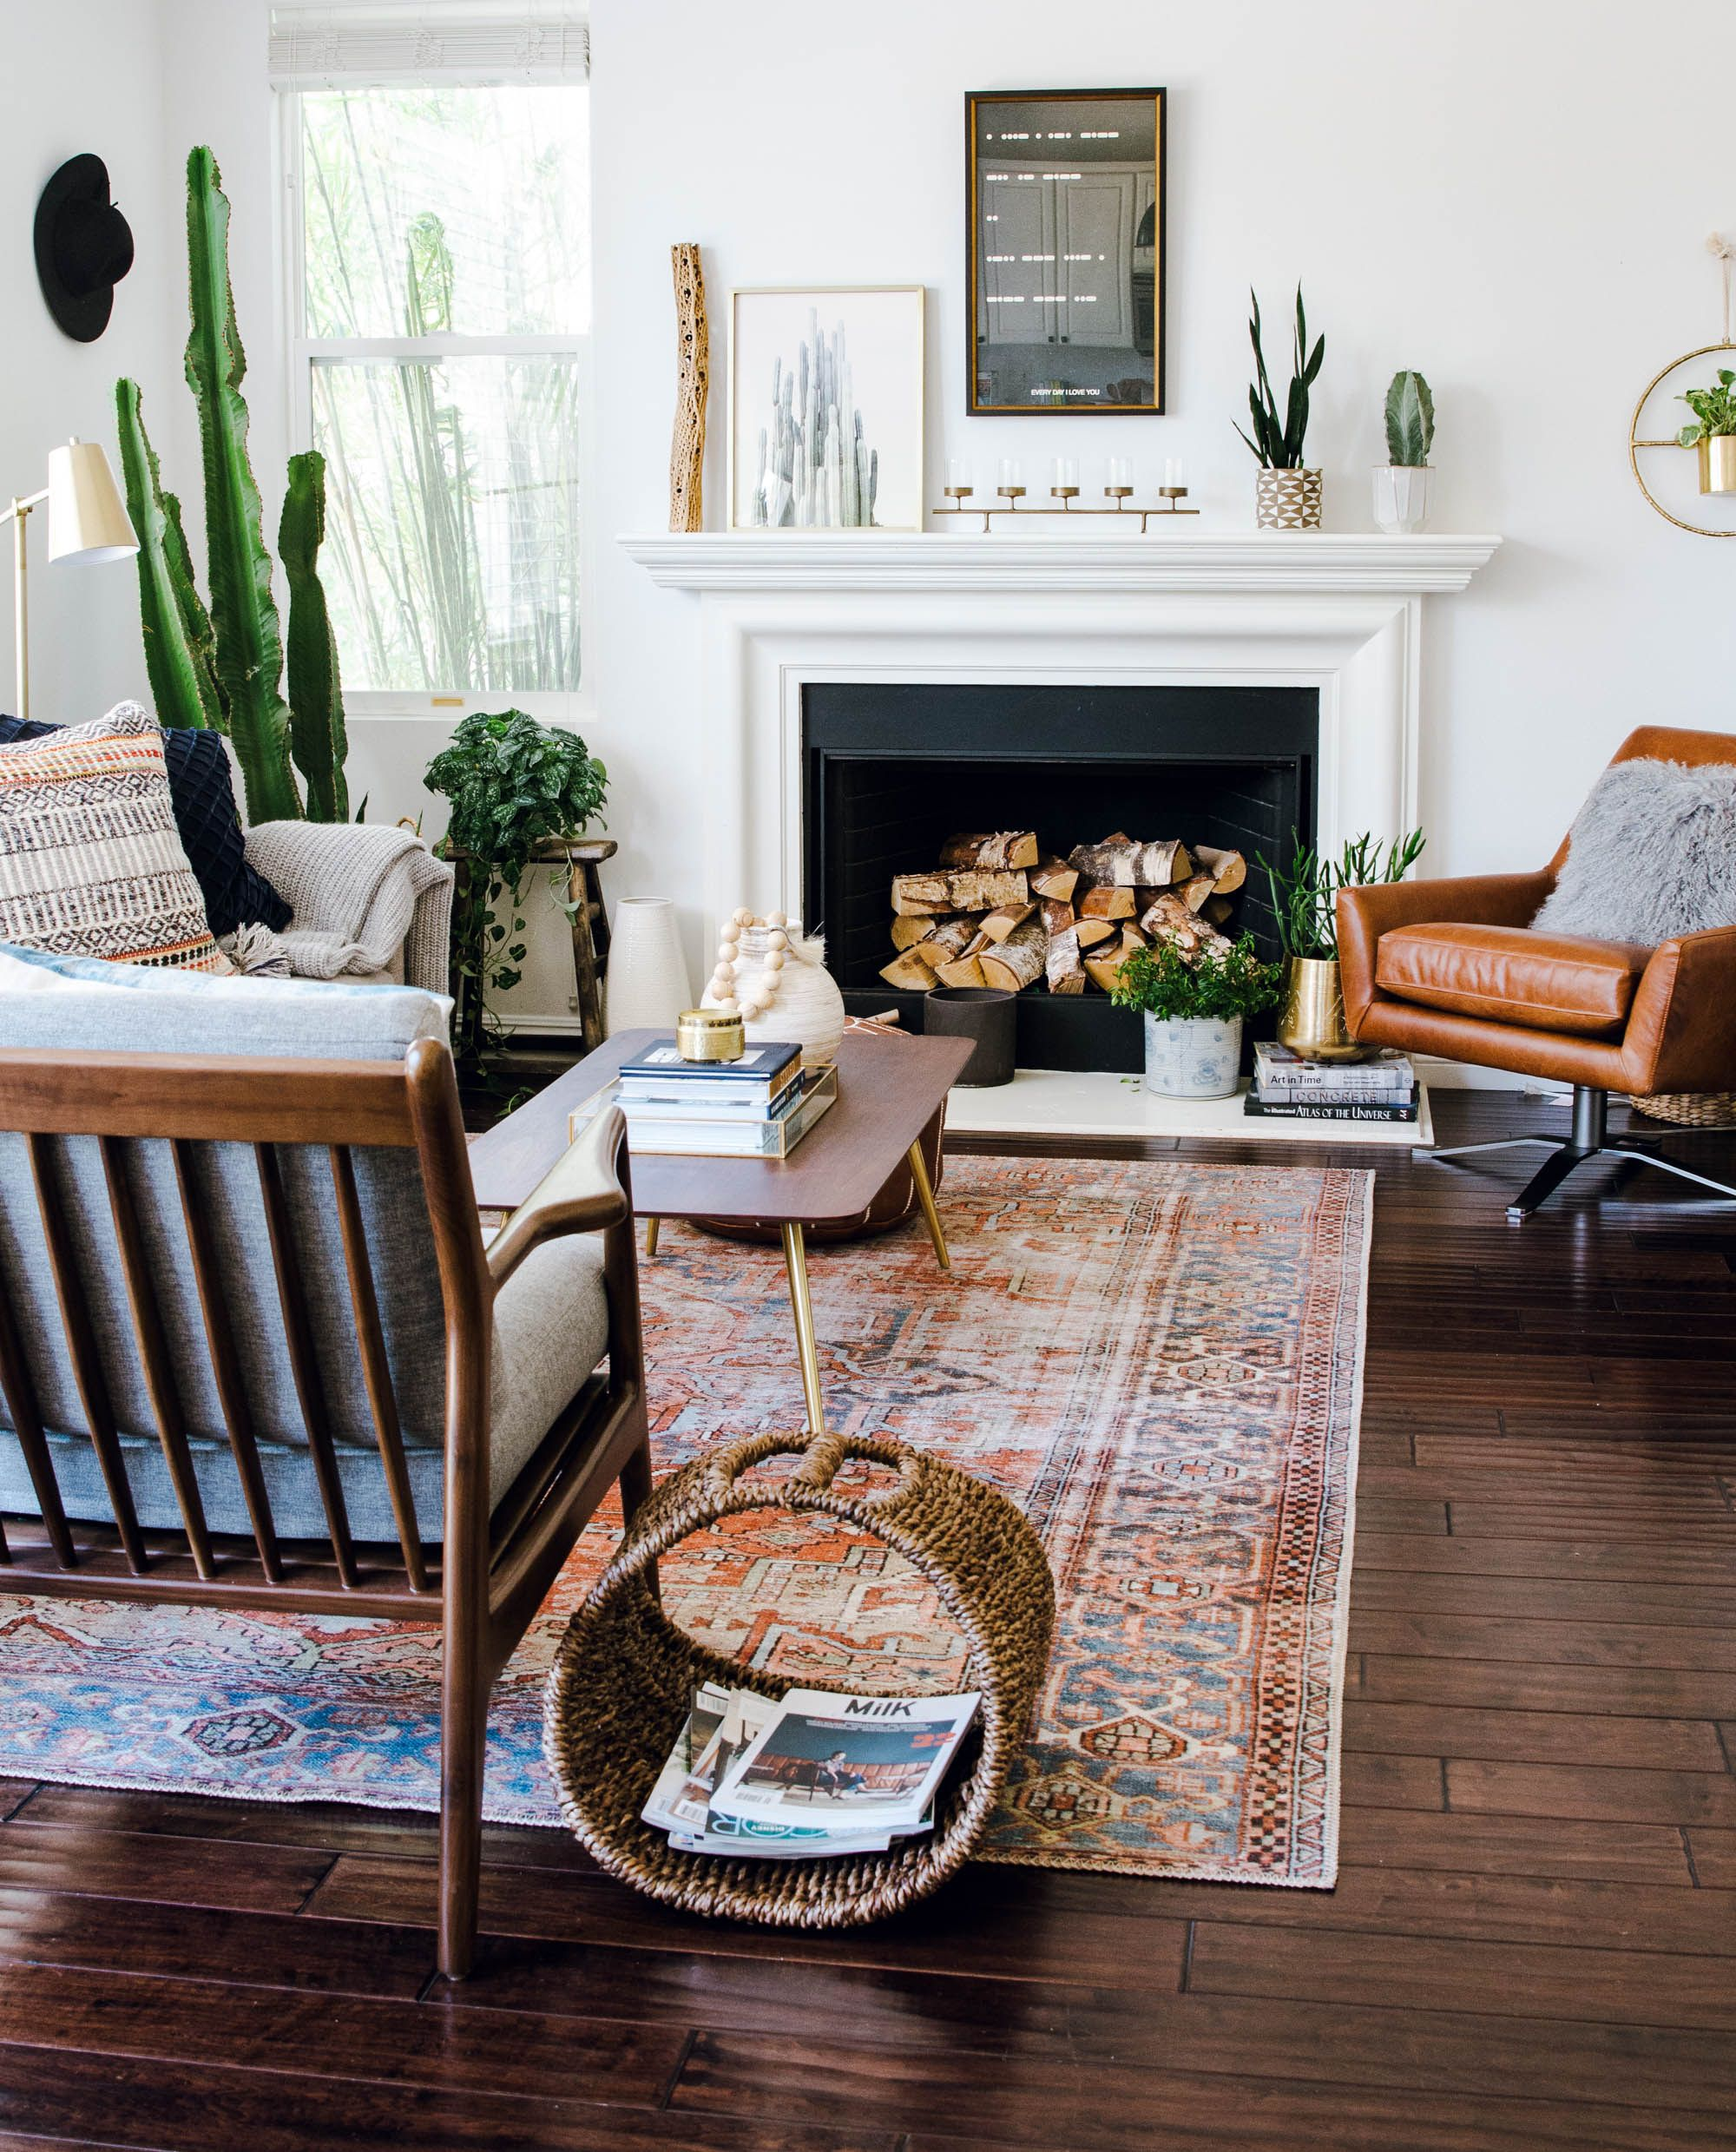 Anita Yokota Interior Designer Licensed Therapist Eclectic Living Room Living Room Scandinavian Home Decor Inspiration